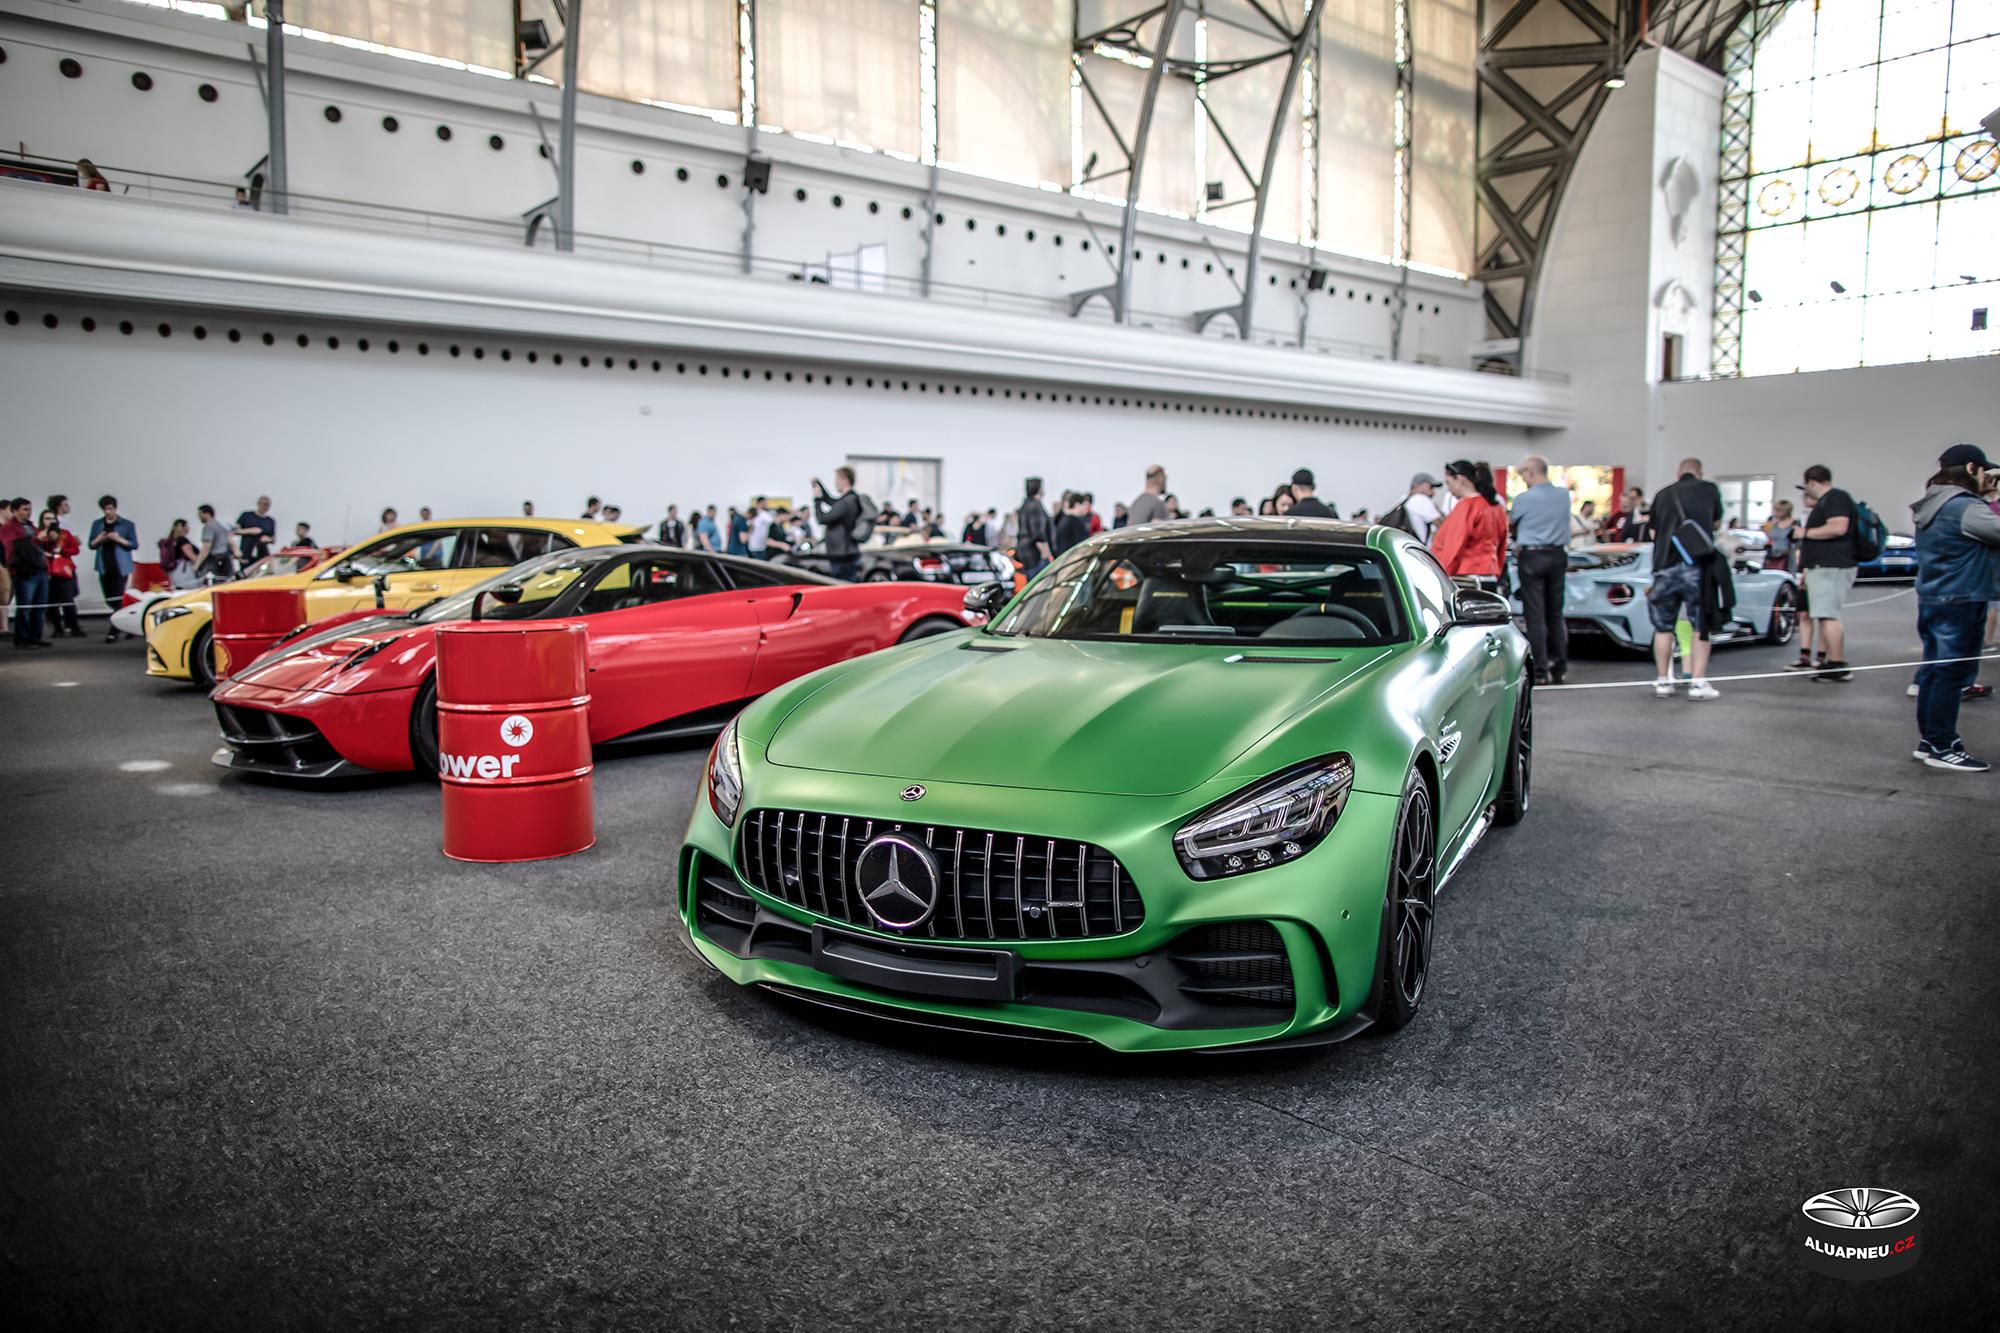 Mercedes Amg Gtr - Automobilové Legendy 2019 - www.aluapneu.cz